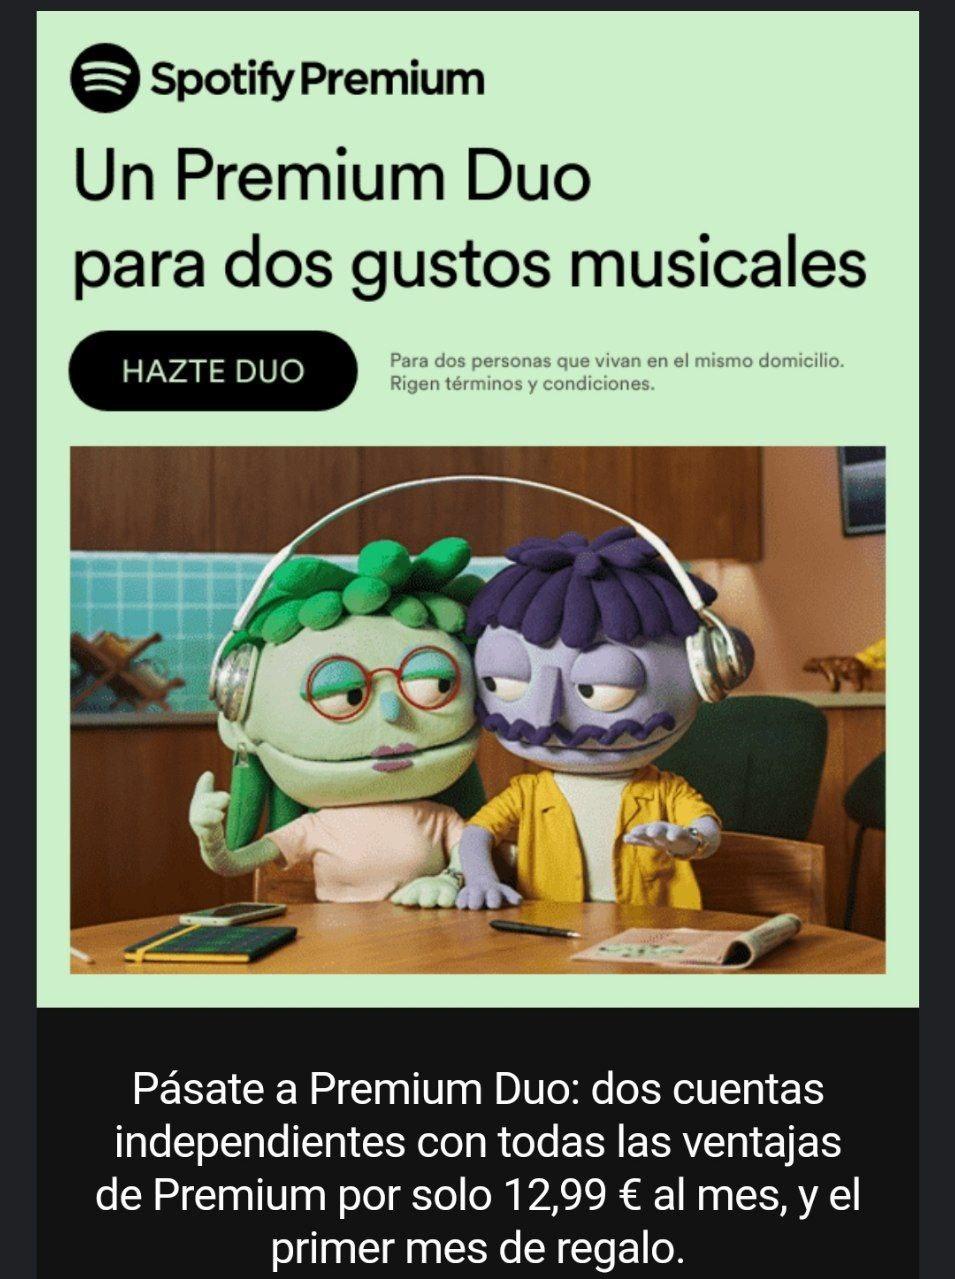 Spotify Premium Duo a 12,99€ entre 2 personas